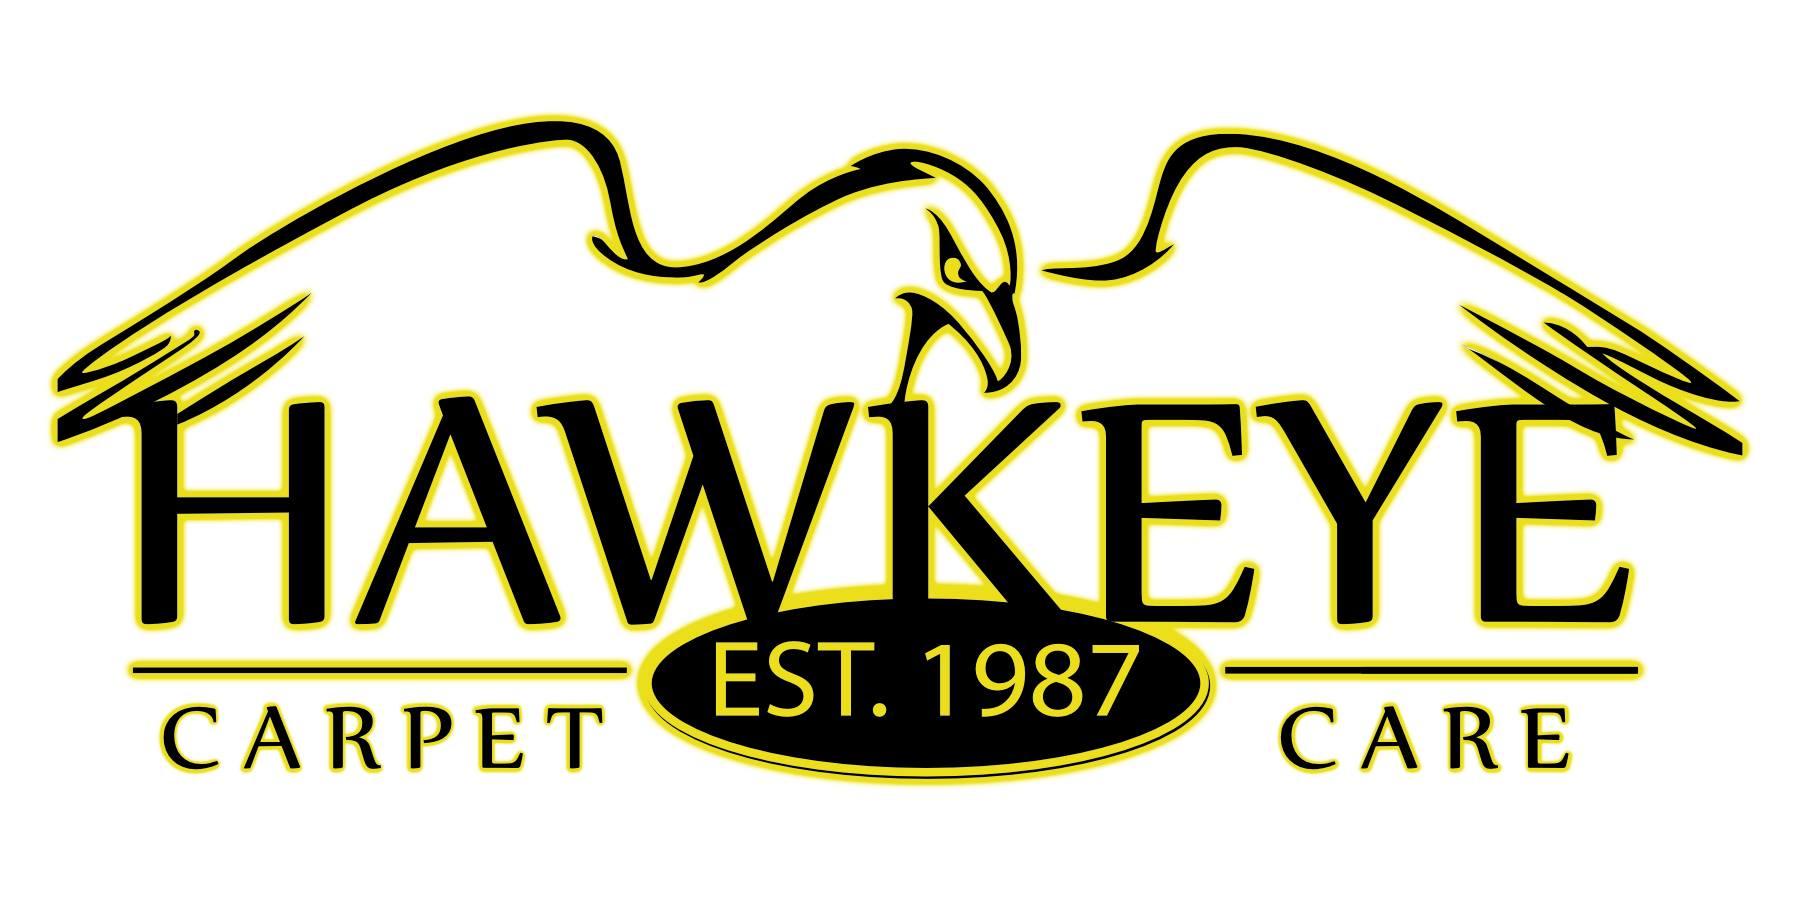 Hawkeye Carpet Cleaning